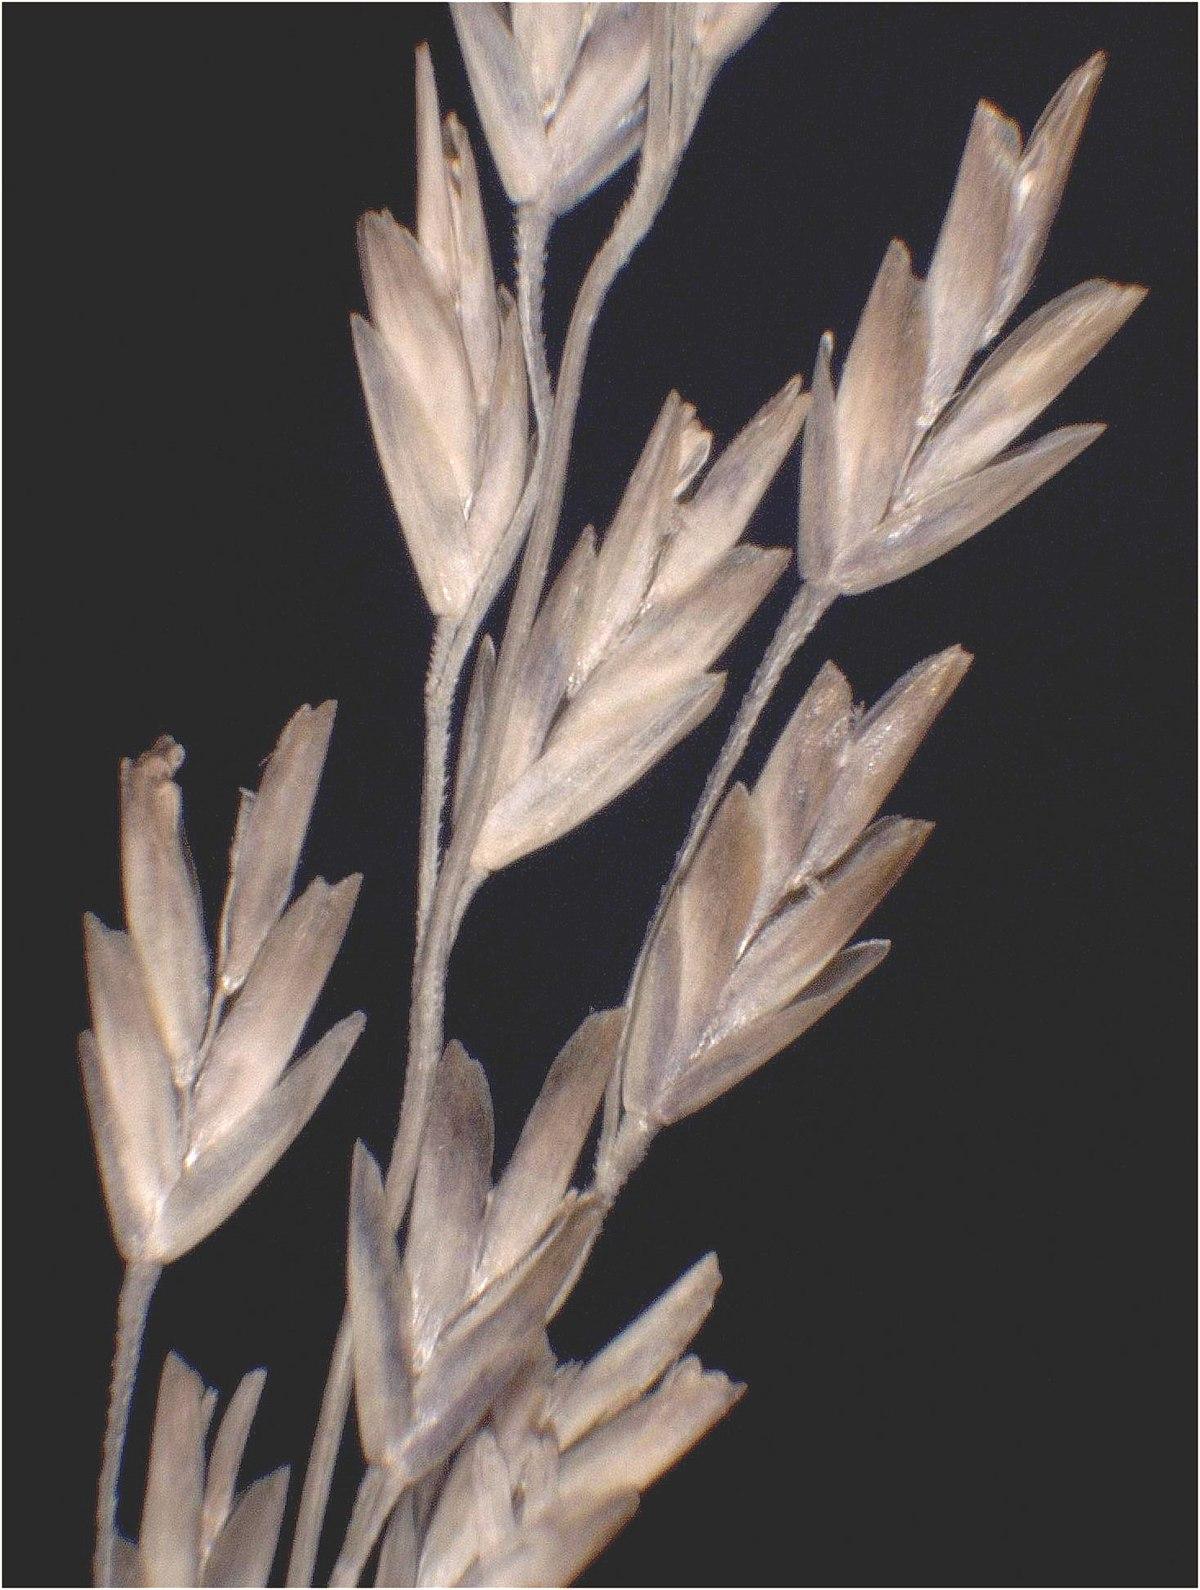 Puccinellia fasciculata - Wikipedia